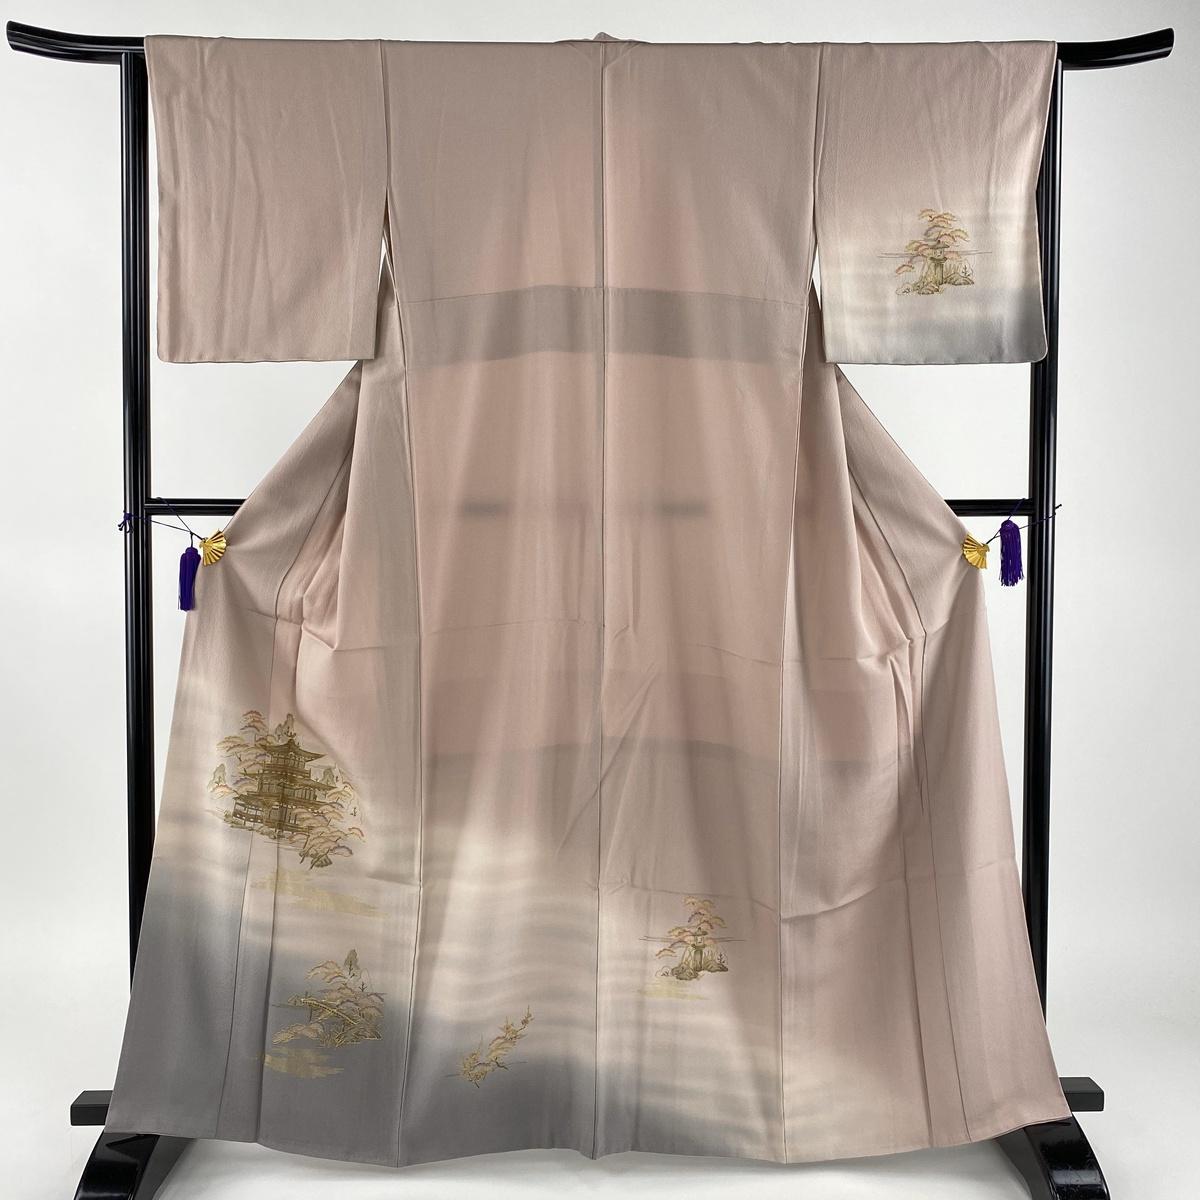 訪問着 美品 秀品 金閣寺 松 金糸 ぼかし 薄紫 袷 身丈164cm 裄丈64cm M 正絹 【中古】